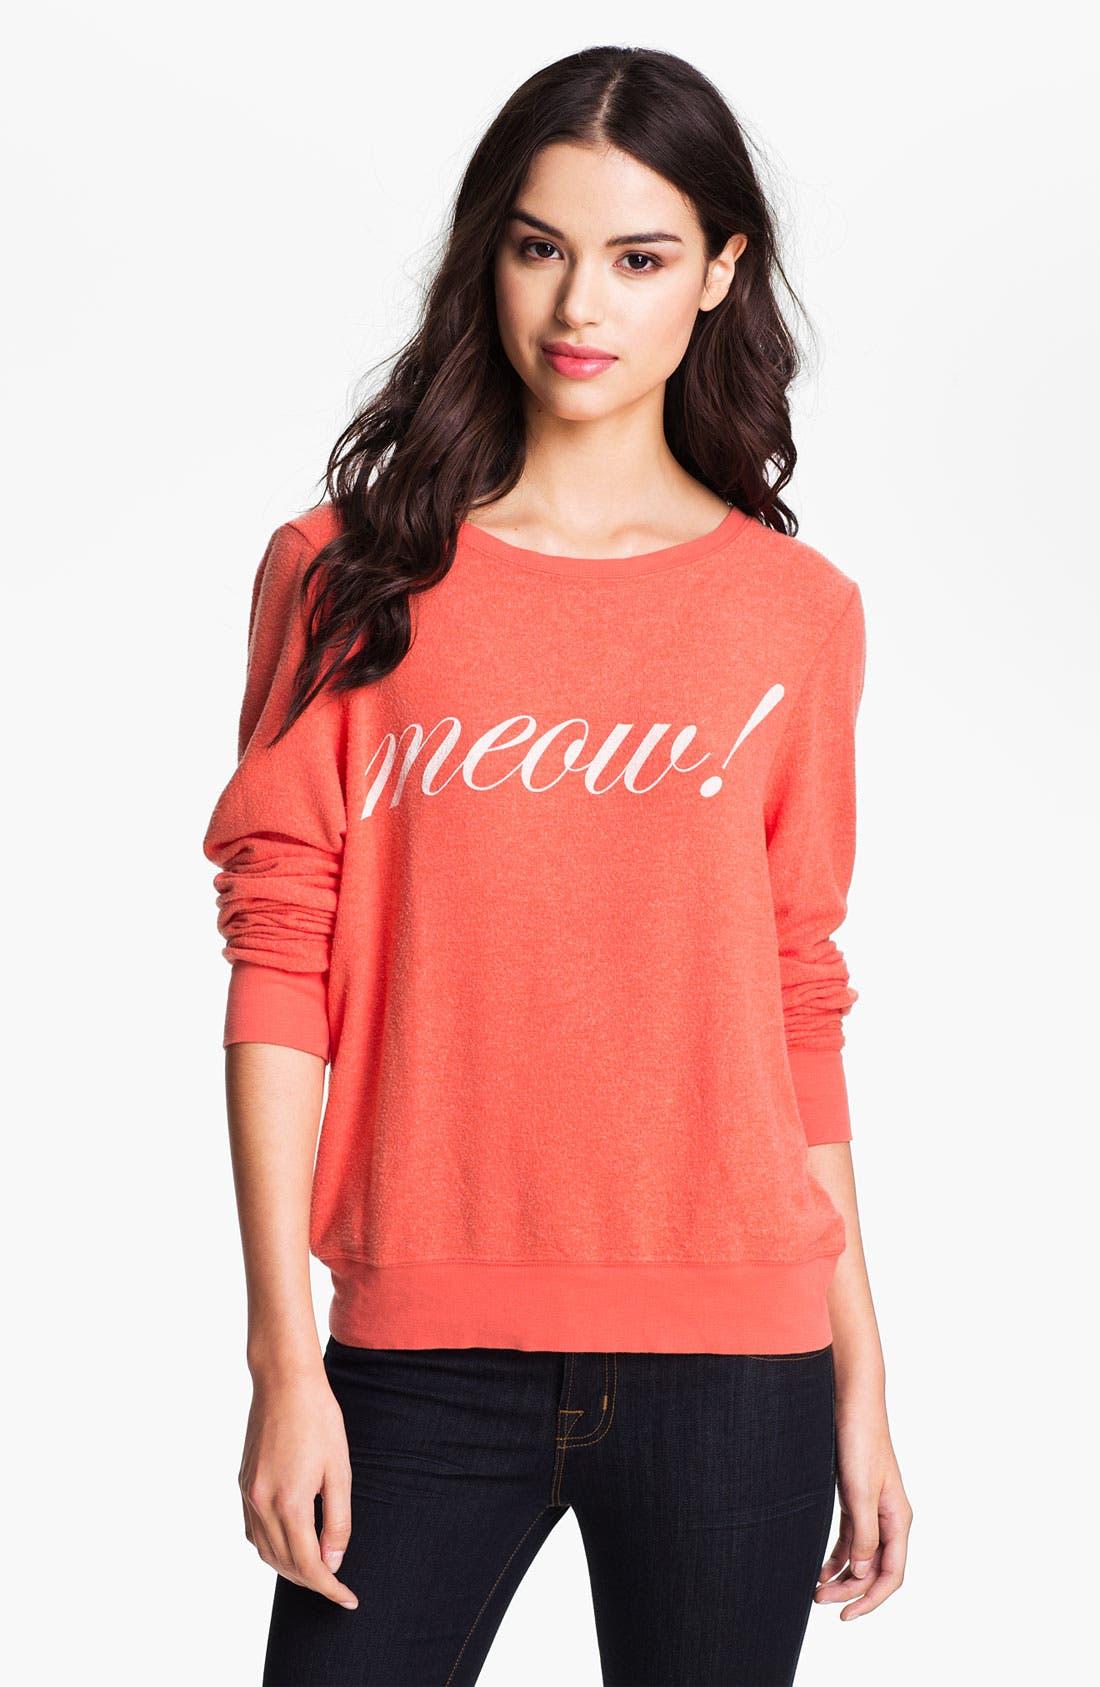 Alternate Image 1 Selected - Wildfox 'Meow!' Graphic Sweatshirt